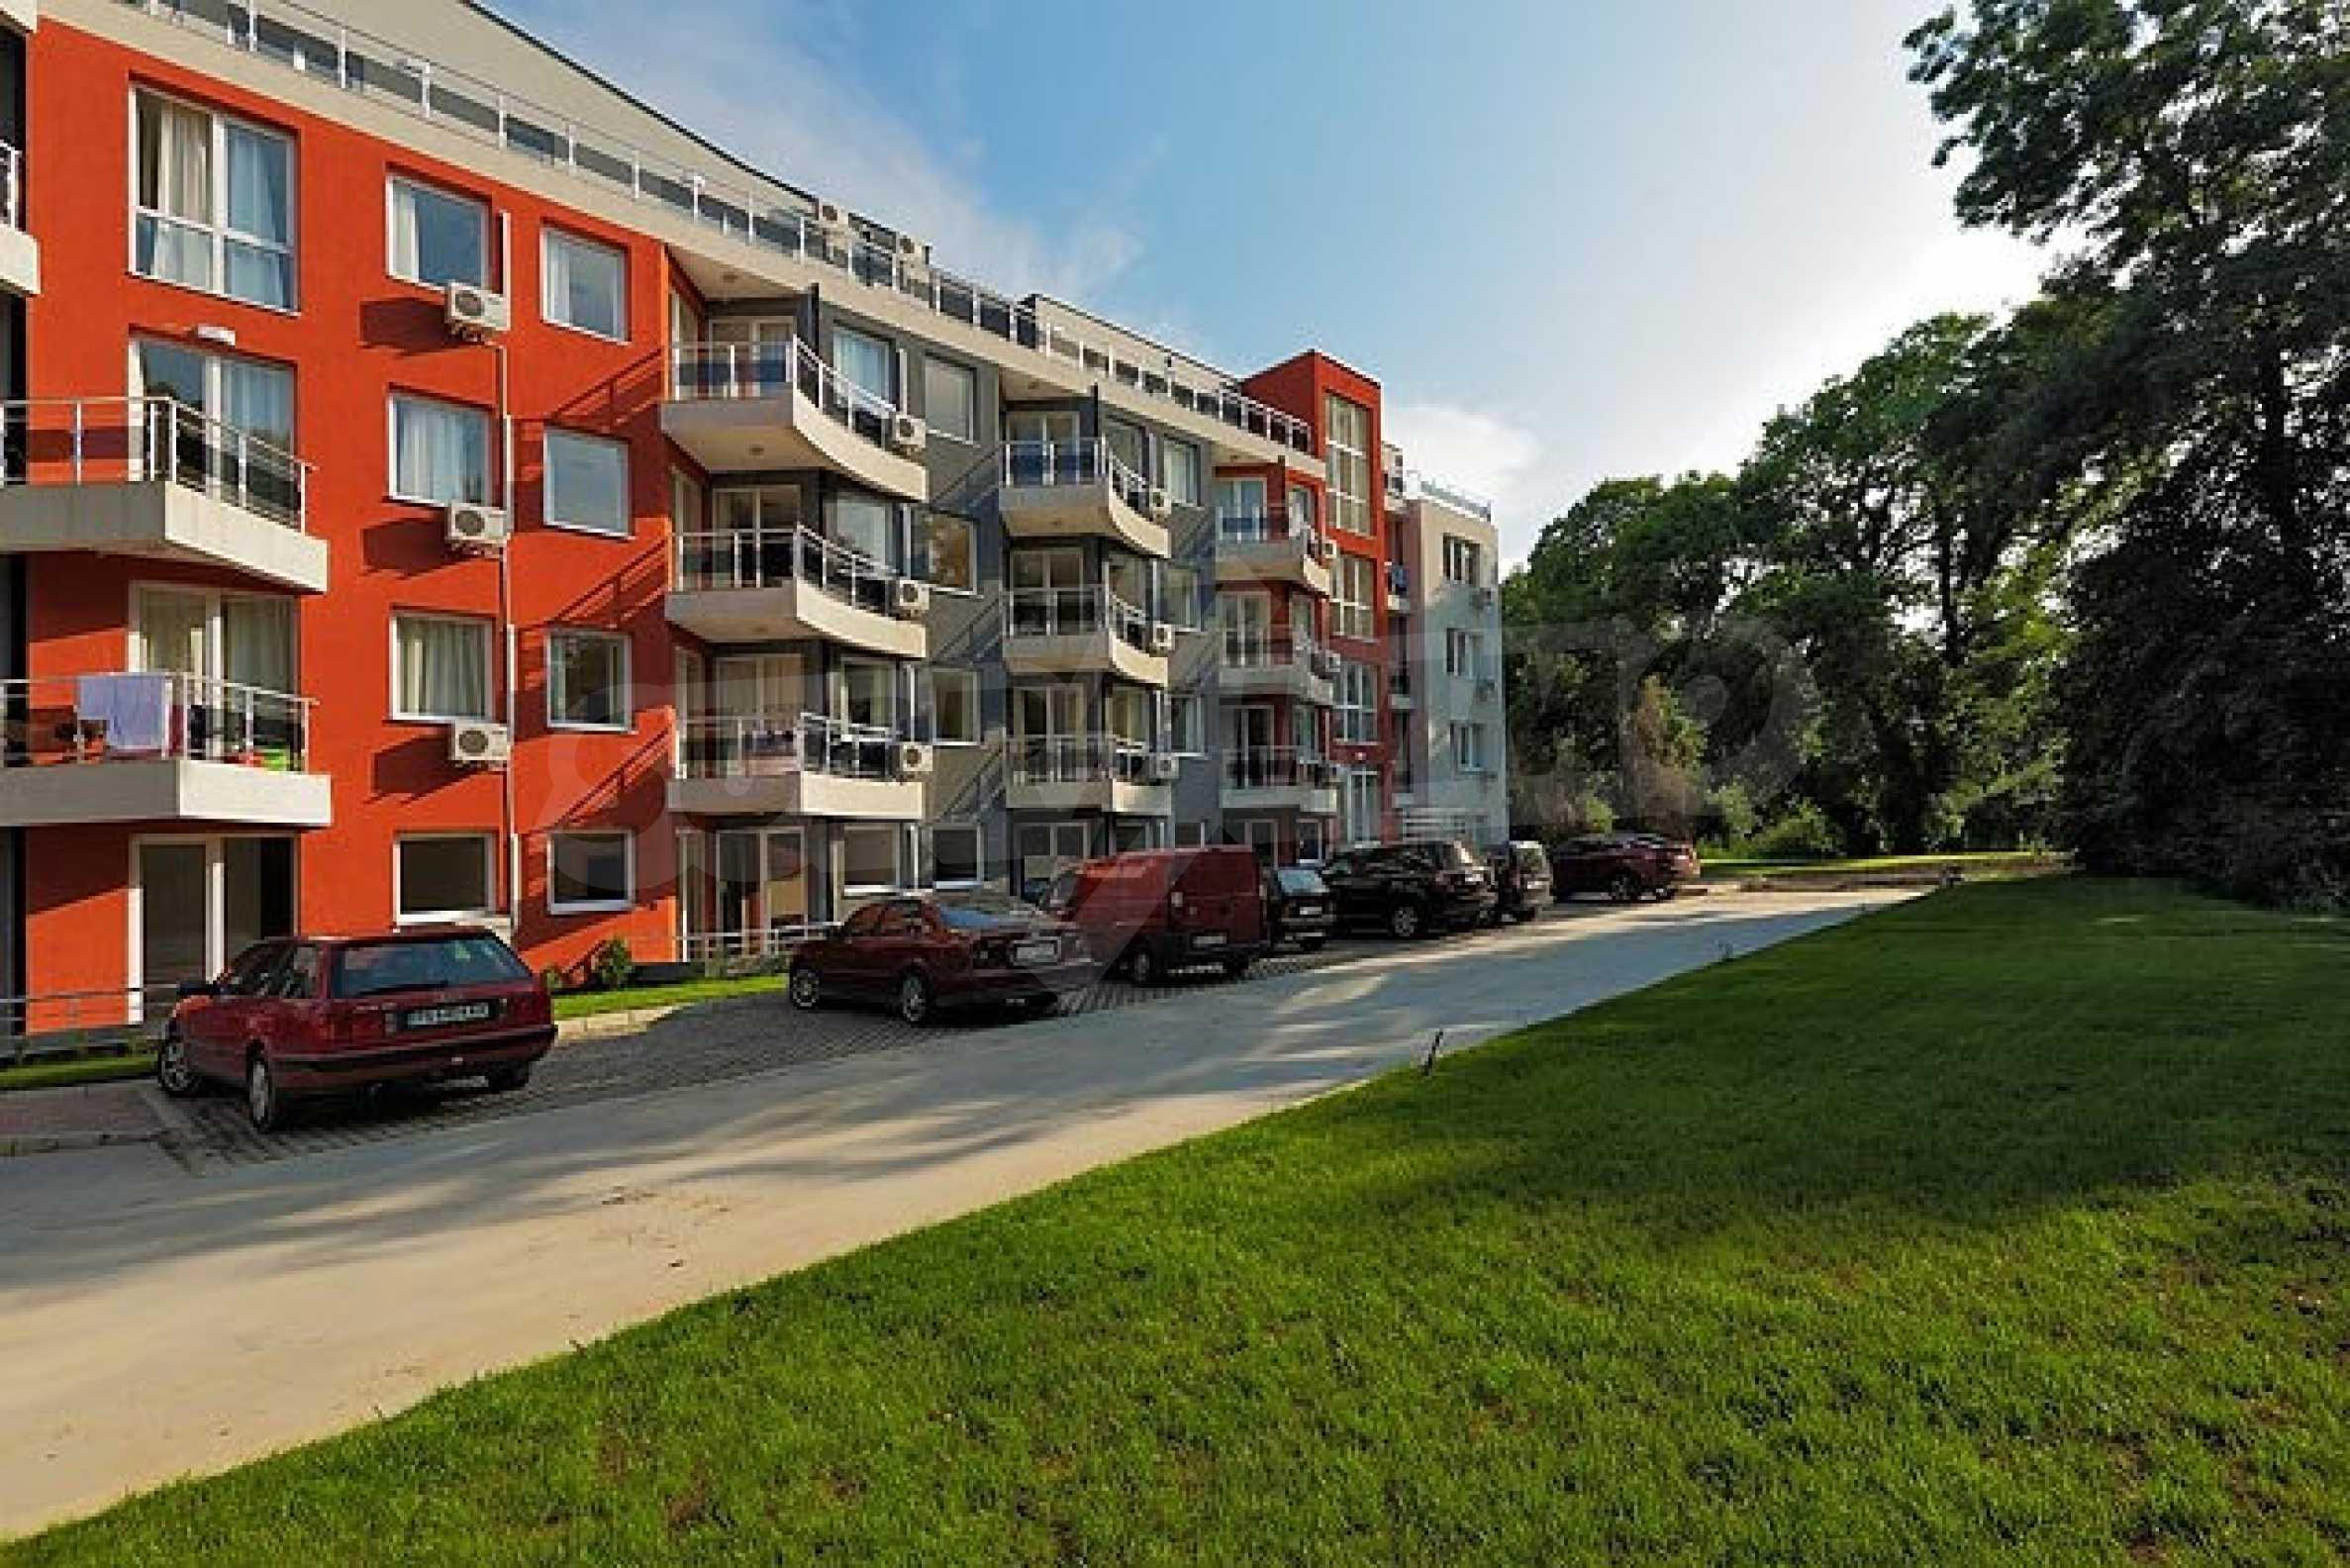 Трехкомнатный апартамент на продажу в комплексе Emberli в курорте Лозенец 6